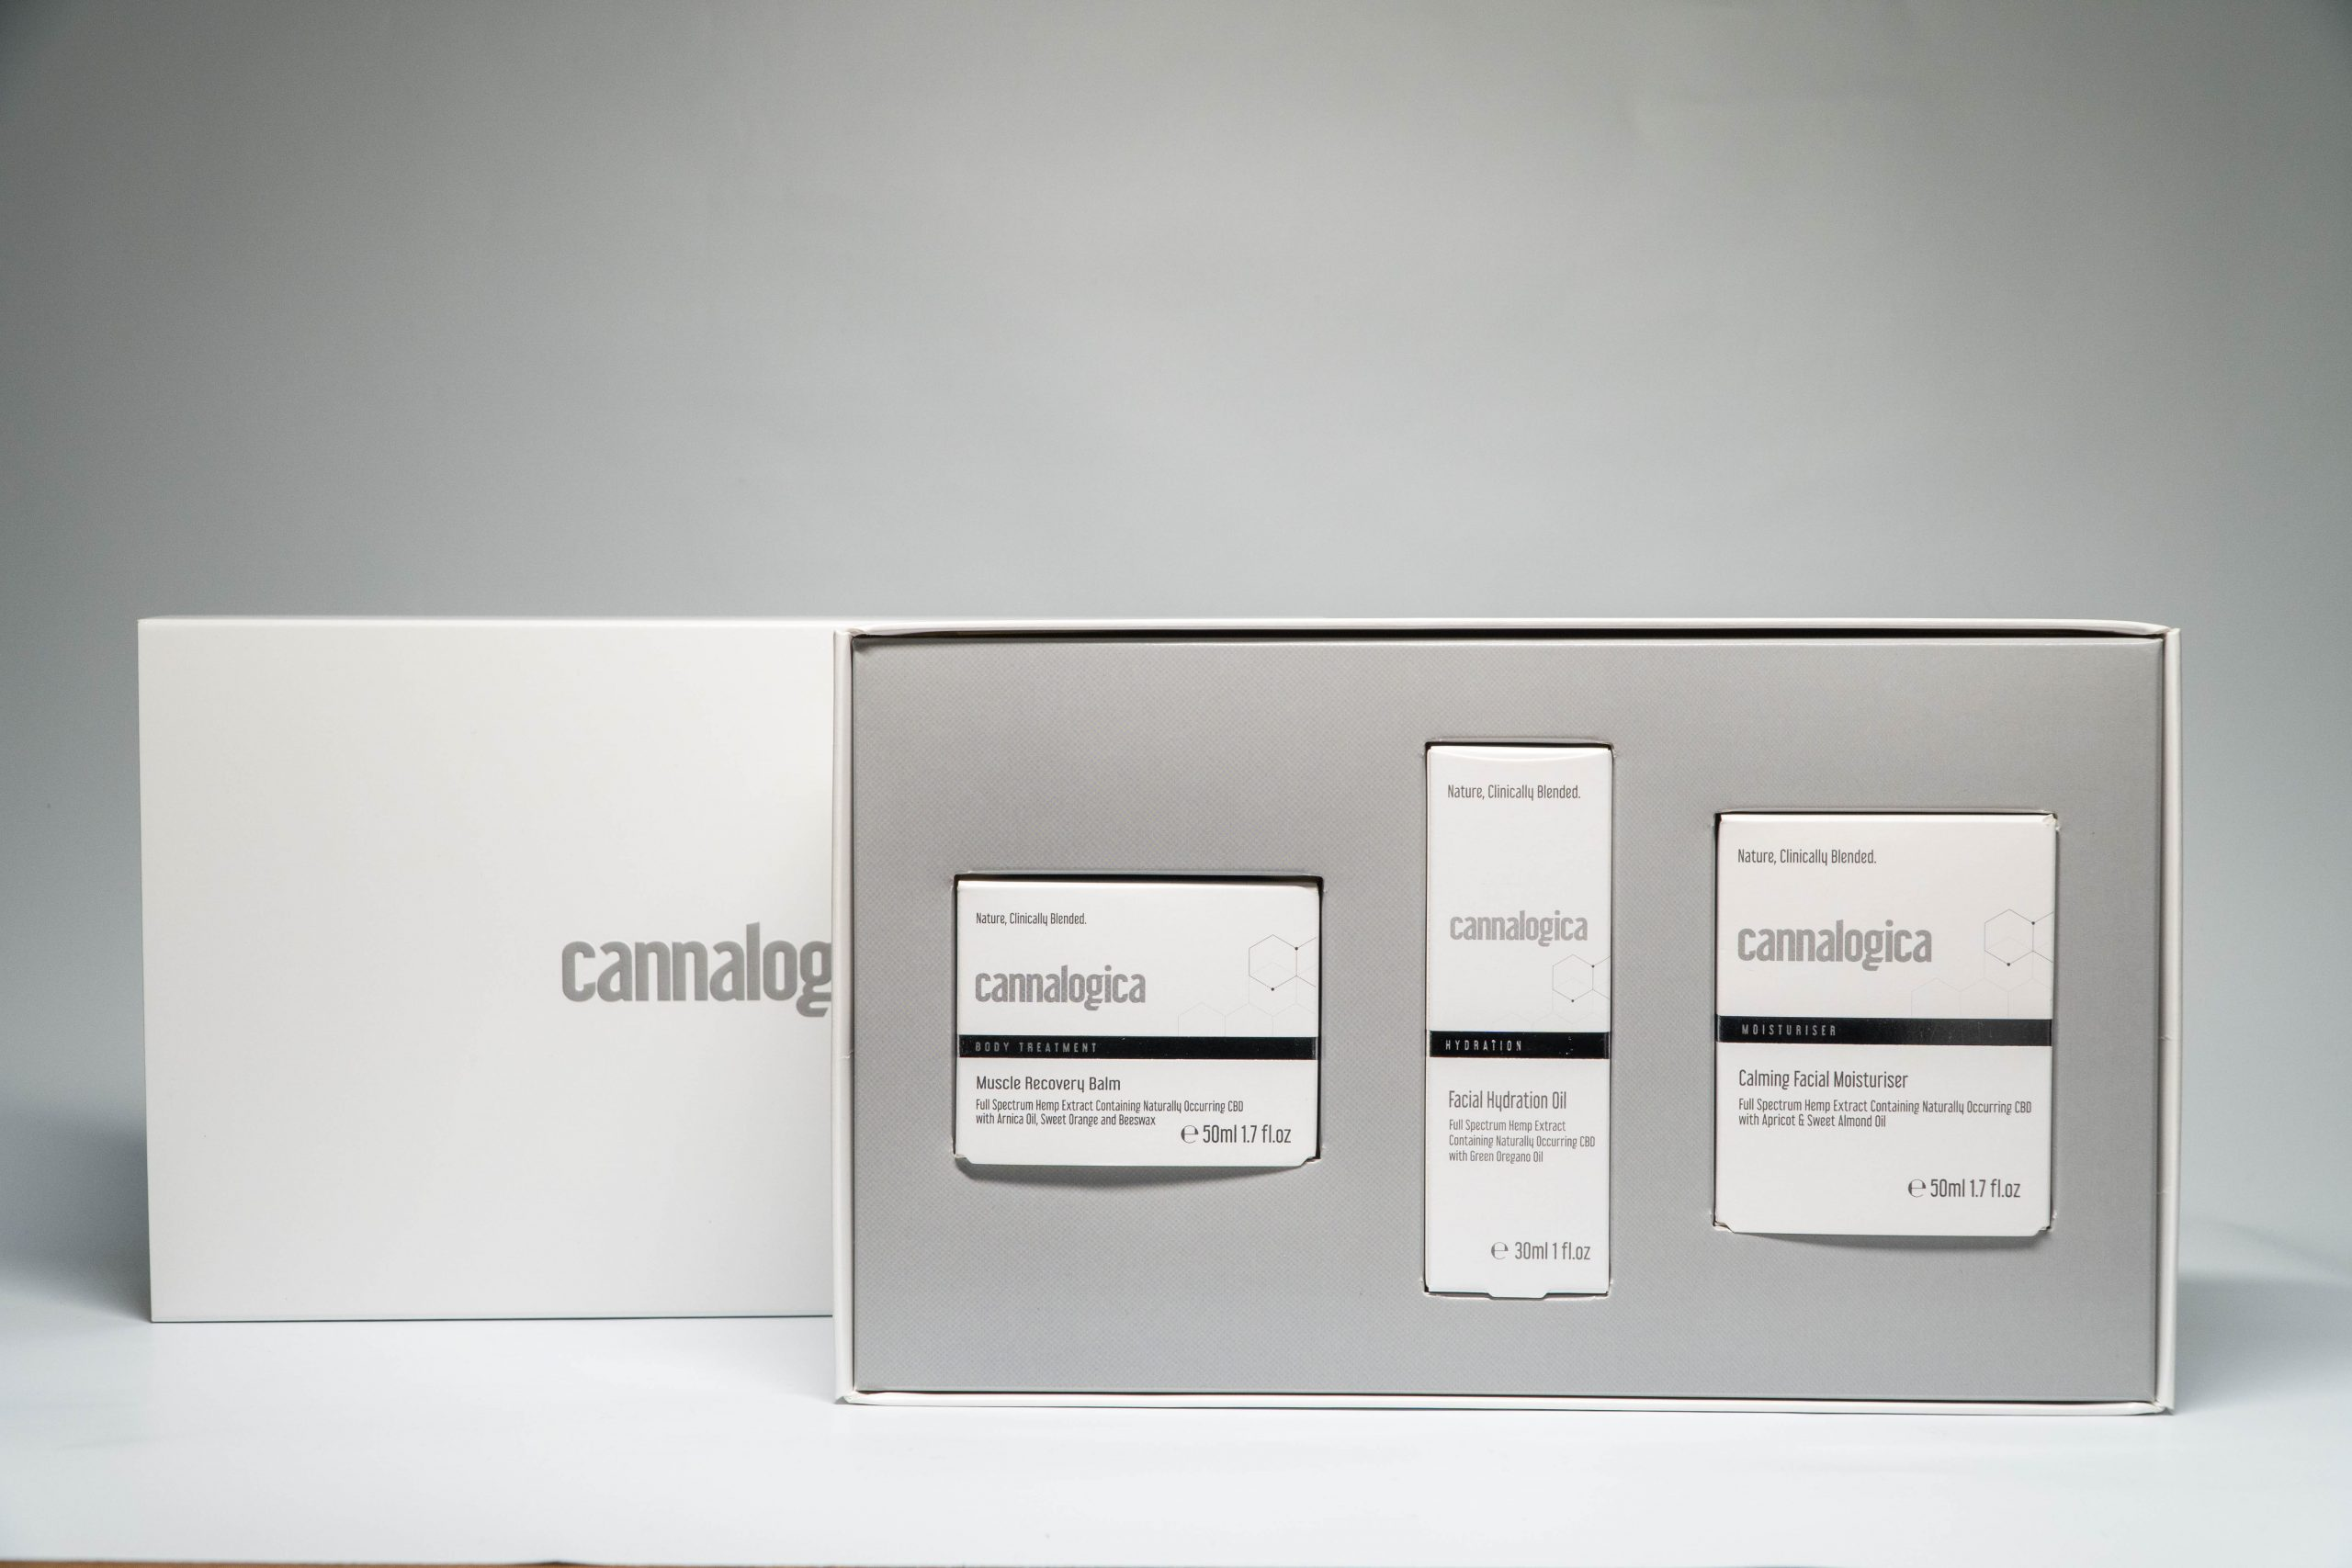 Cannalogica skincare line